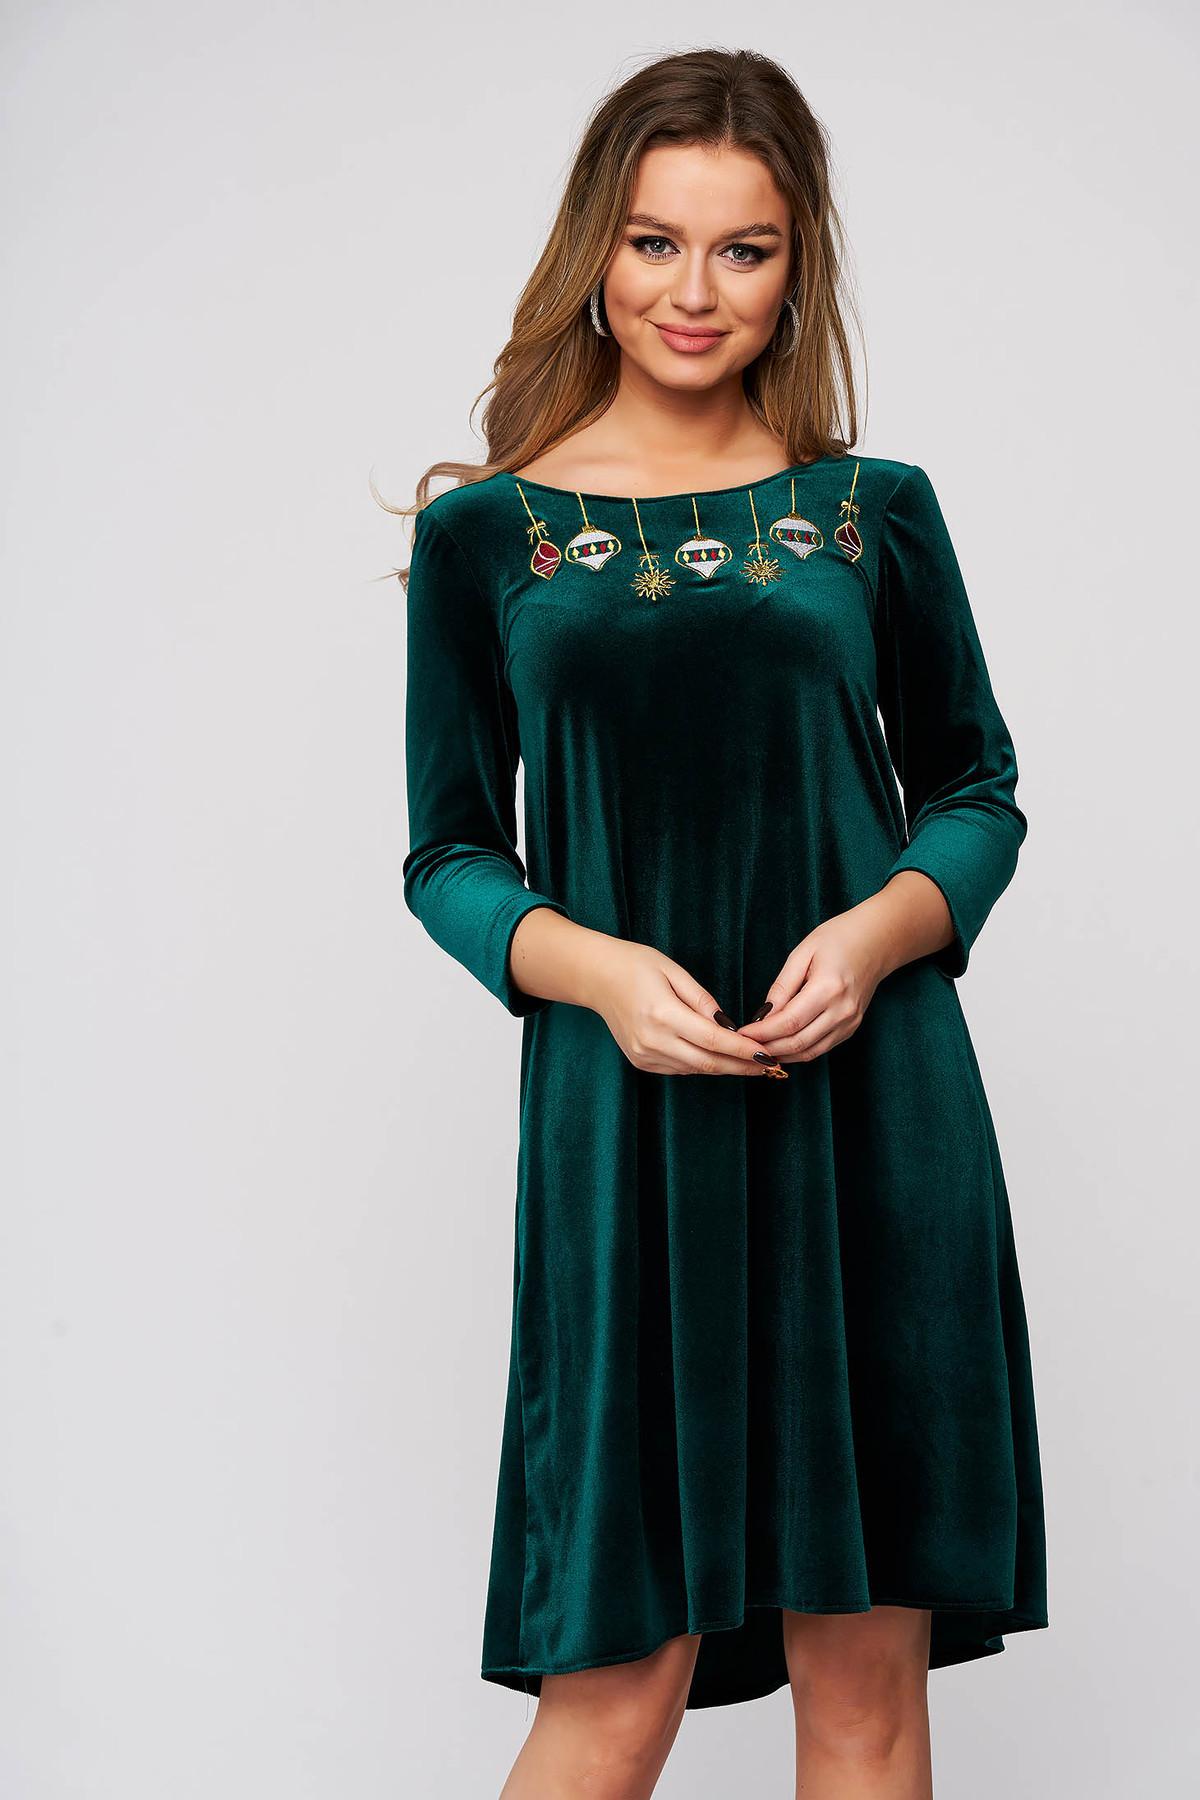 Rochie StarShinerS verde de ocazie din catifea cu croi larg decolteu in v la spate broderie in fata captusita pe interior